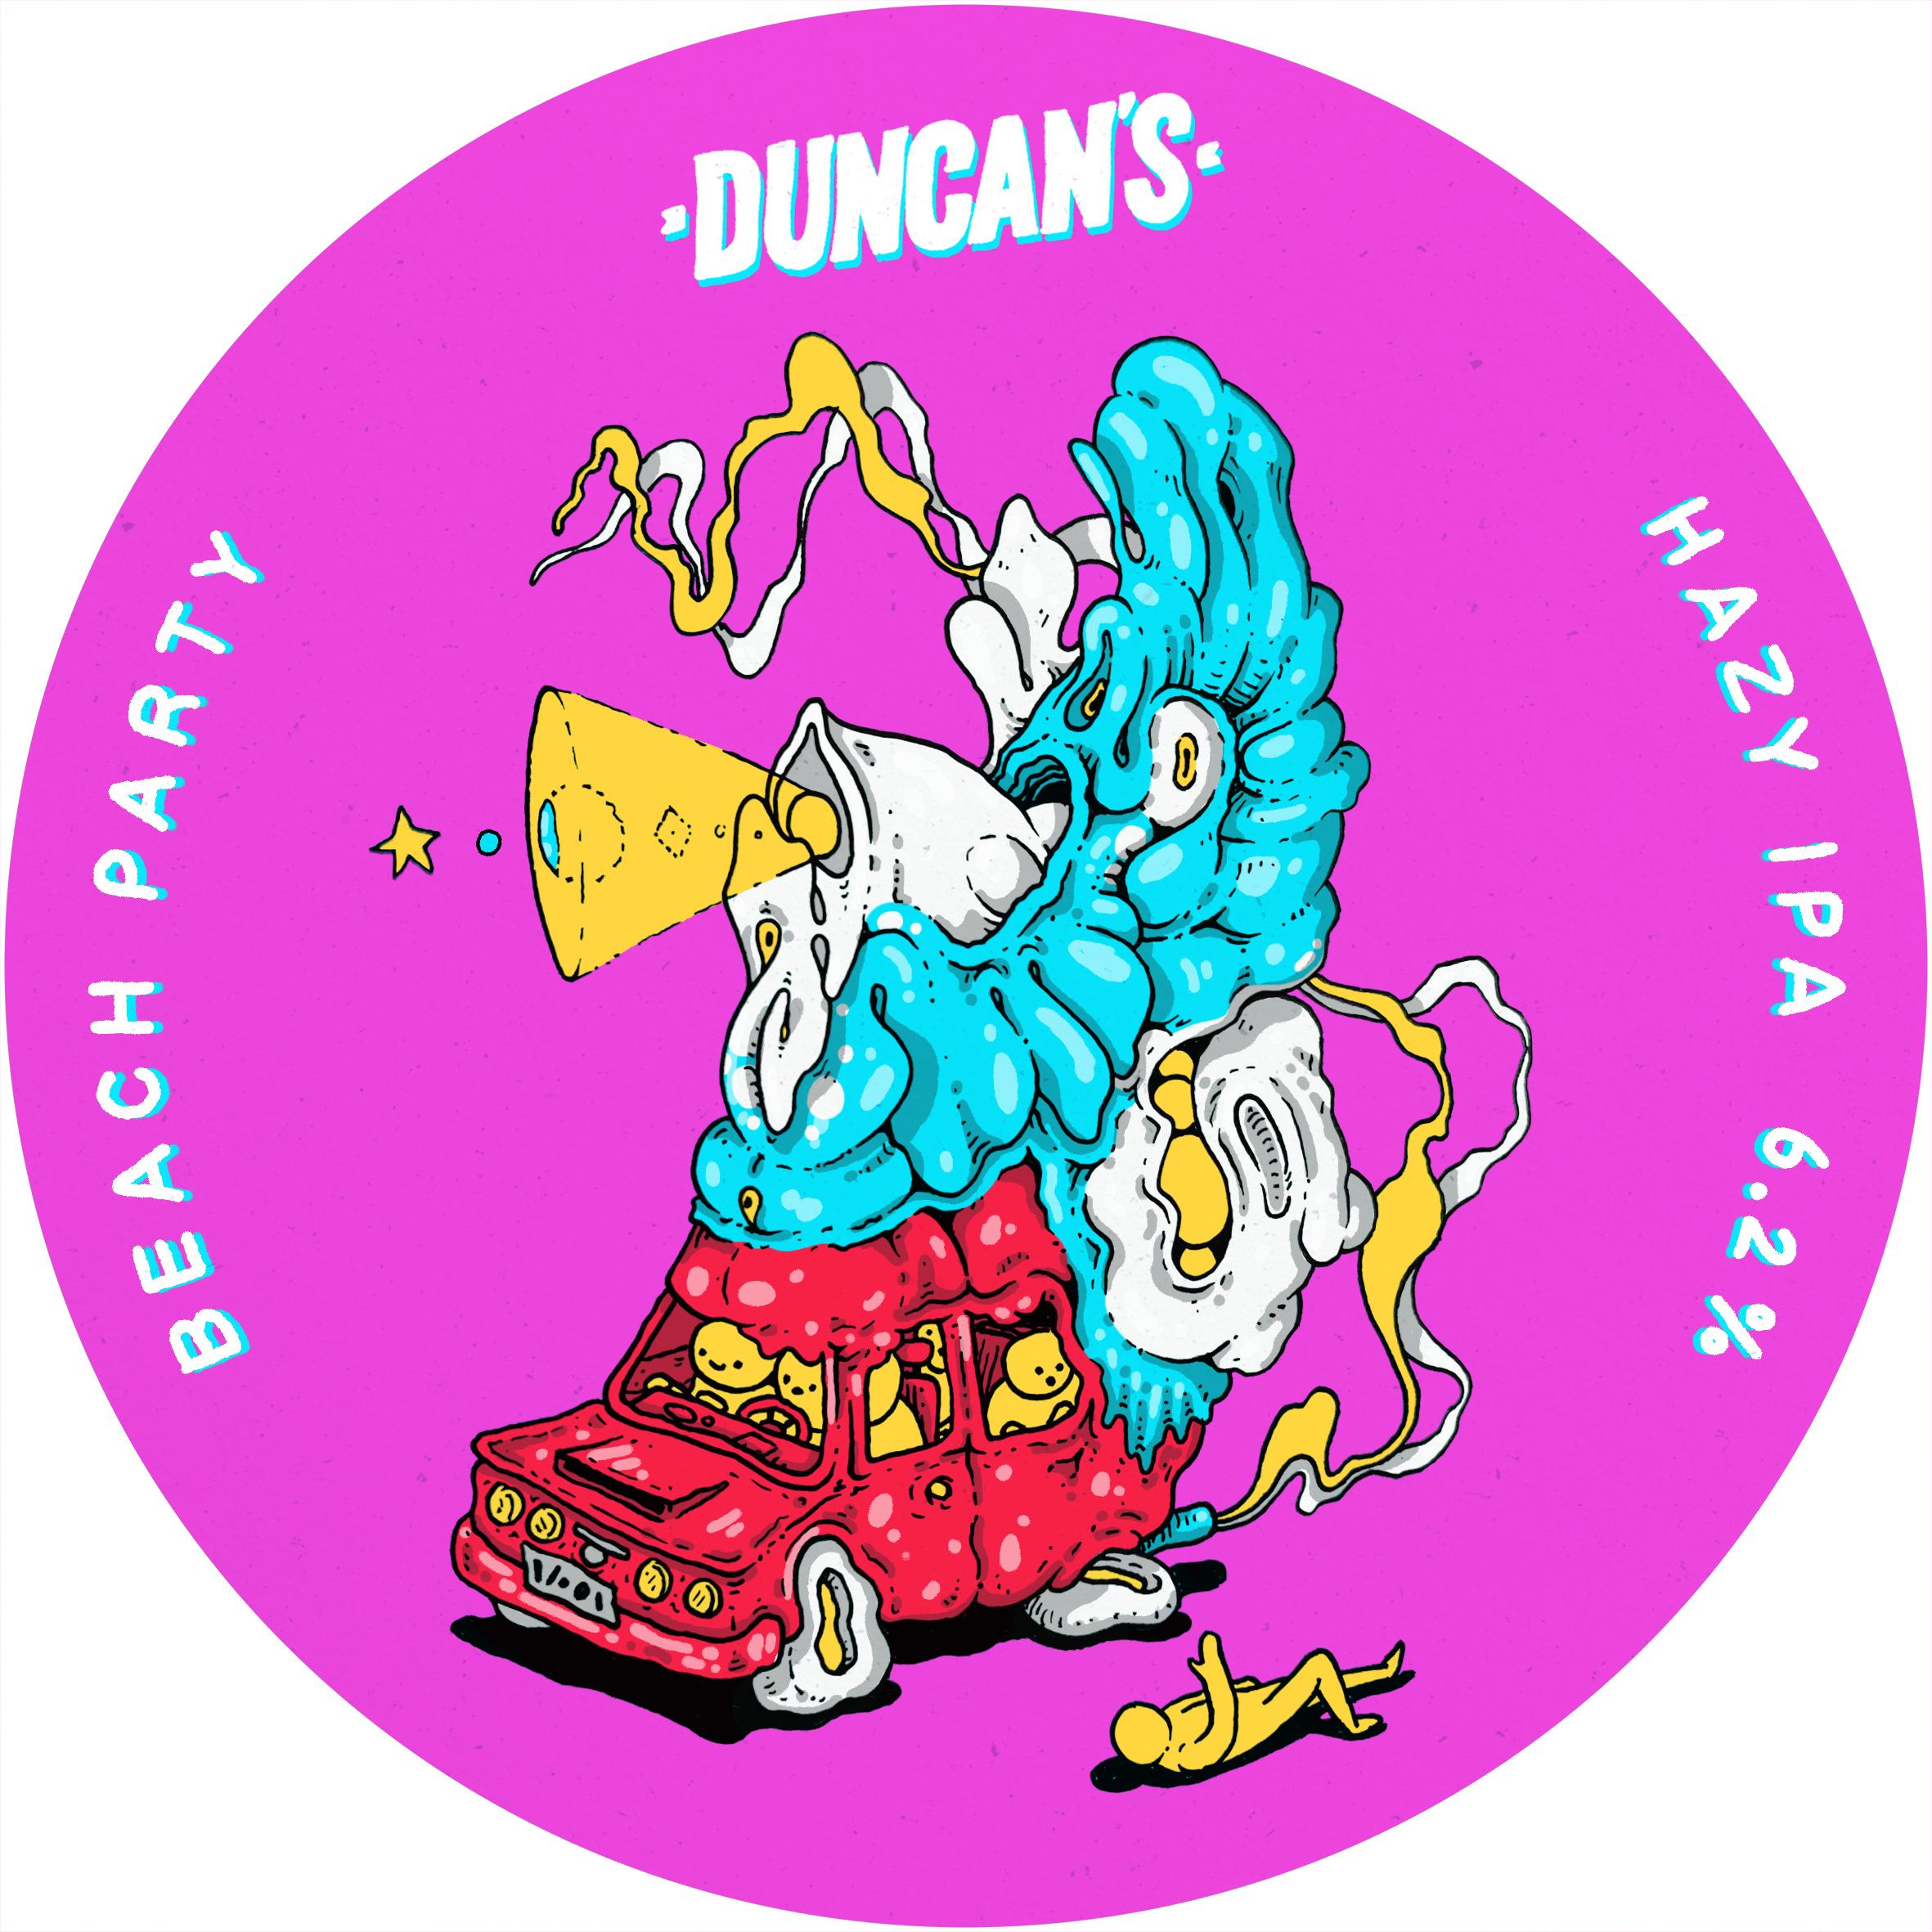 Duncans_beachparty_circle.jpg